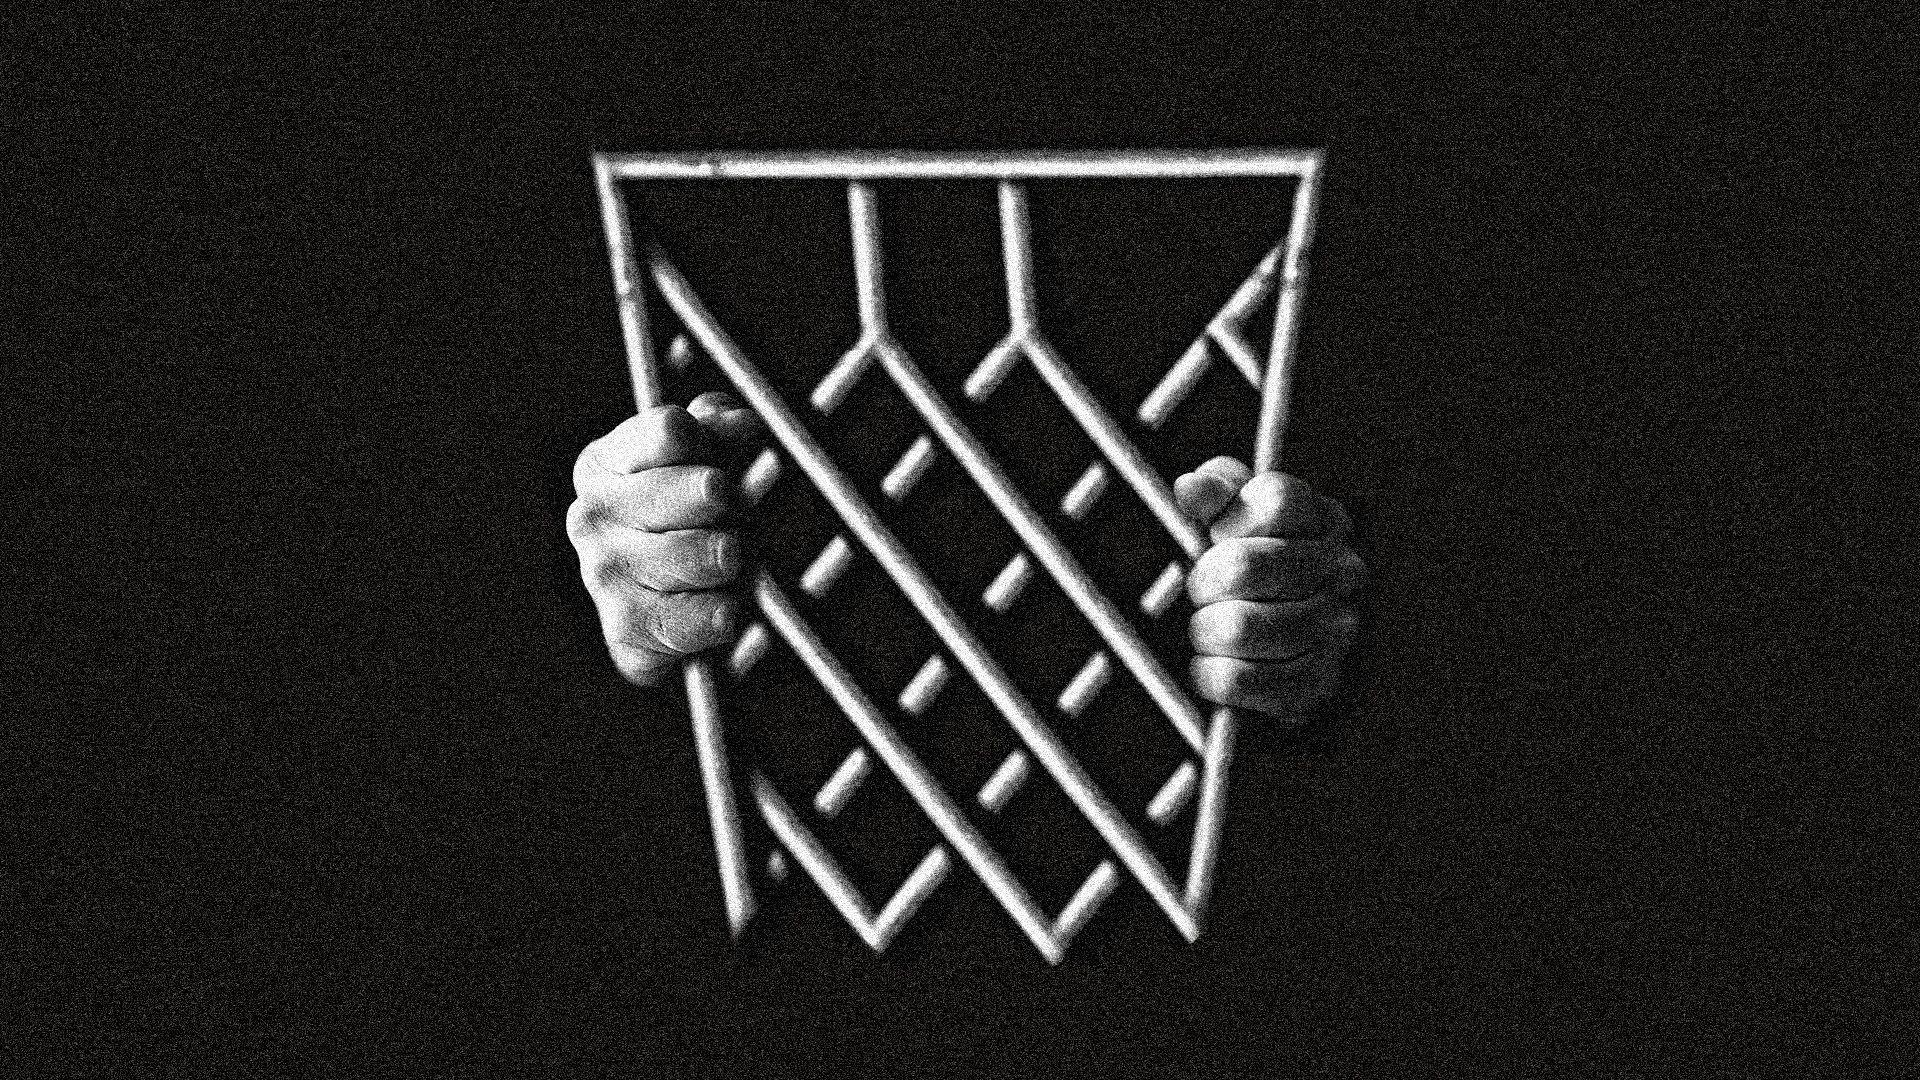 93d6bd06487c3 1 big thing  🏀 Three sentenced in recruiting scandal